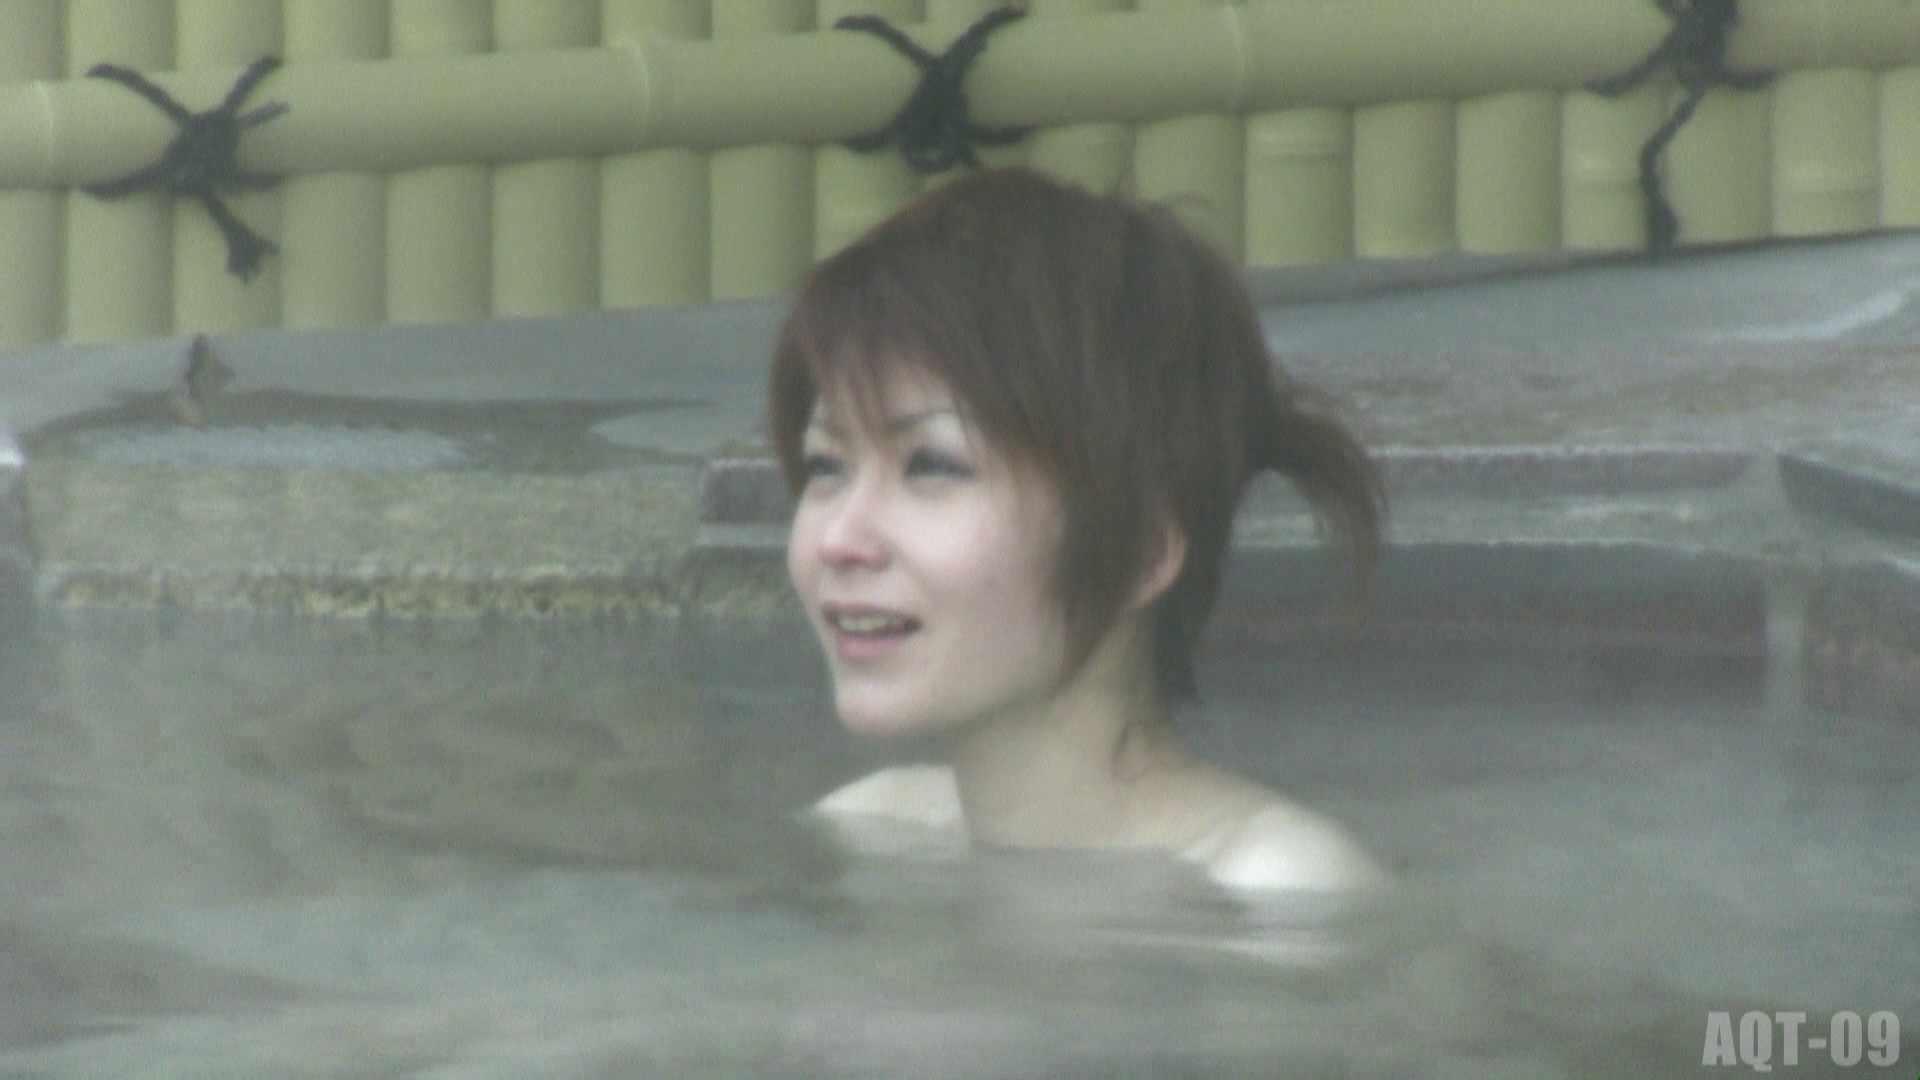 Aquaな露天風呂Vol.779 露天風呂 | OLのエロ生活  81連発 1